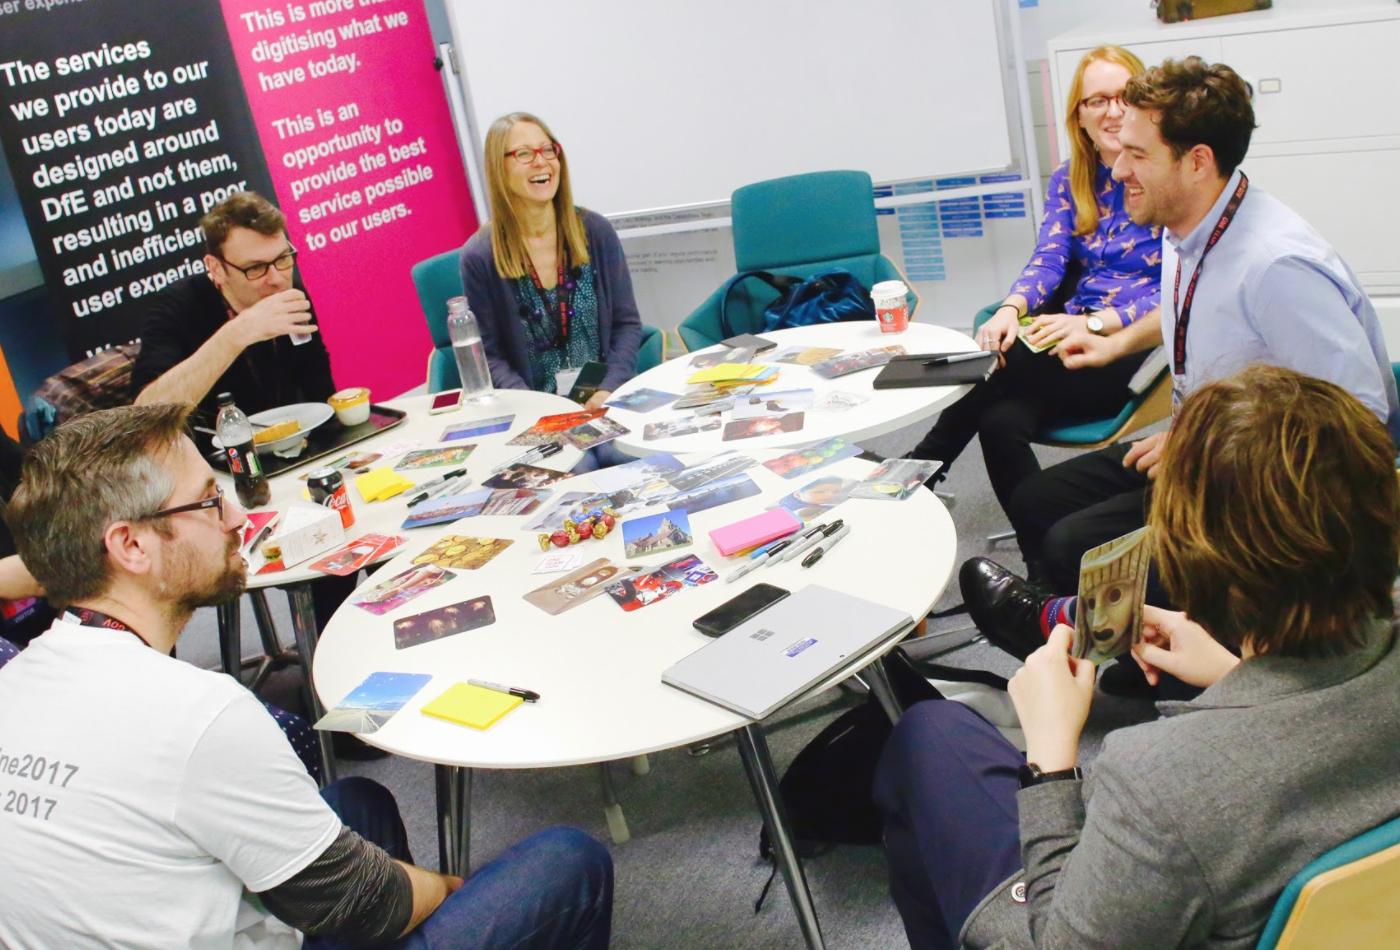 Group meeting at DfE Digital